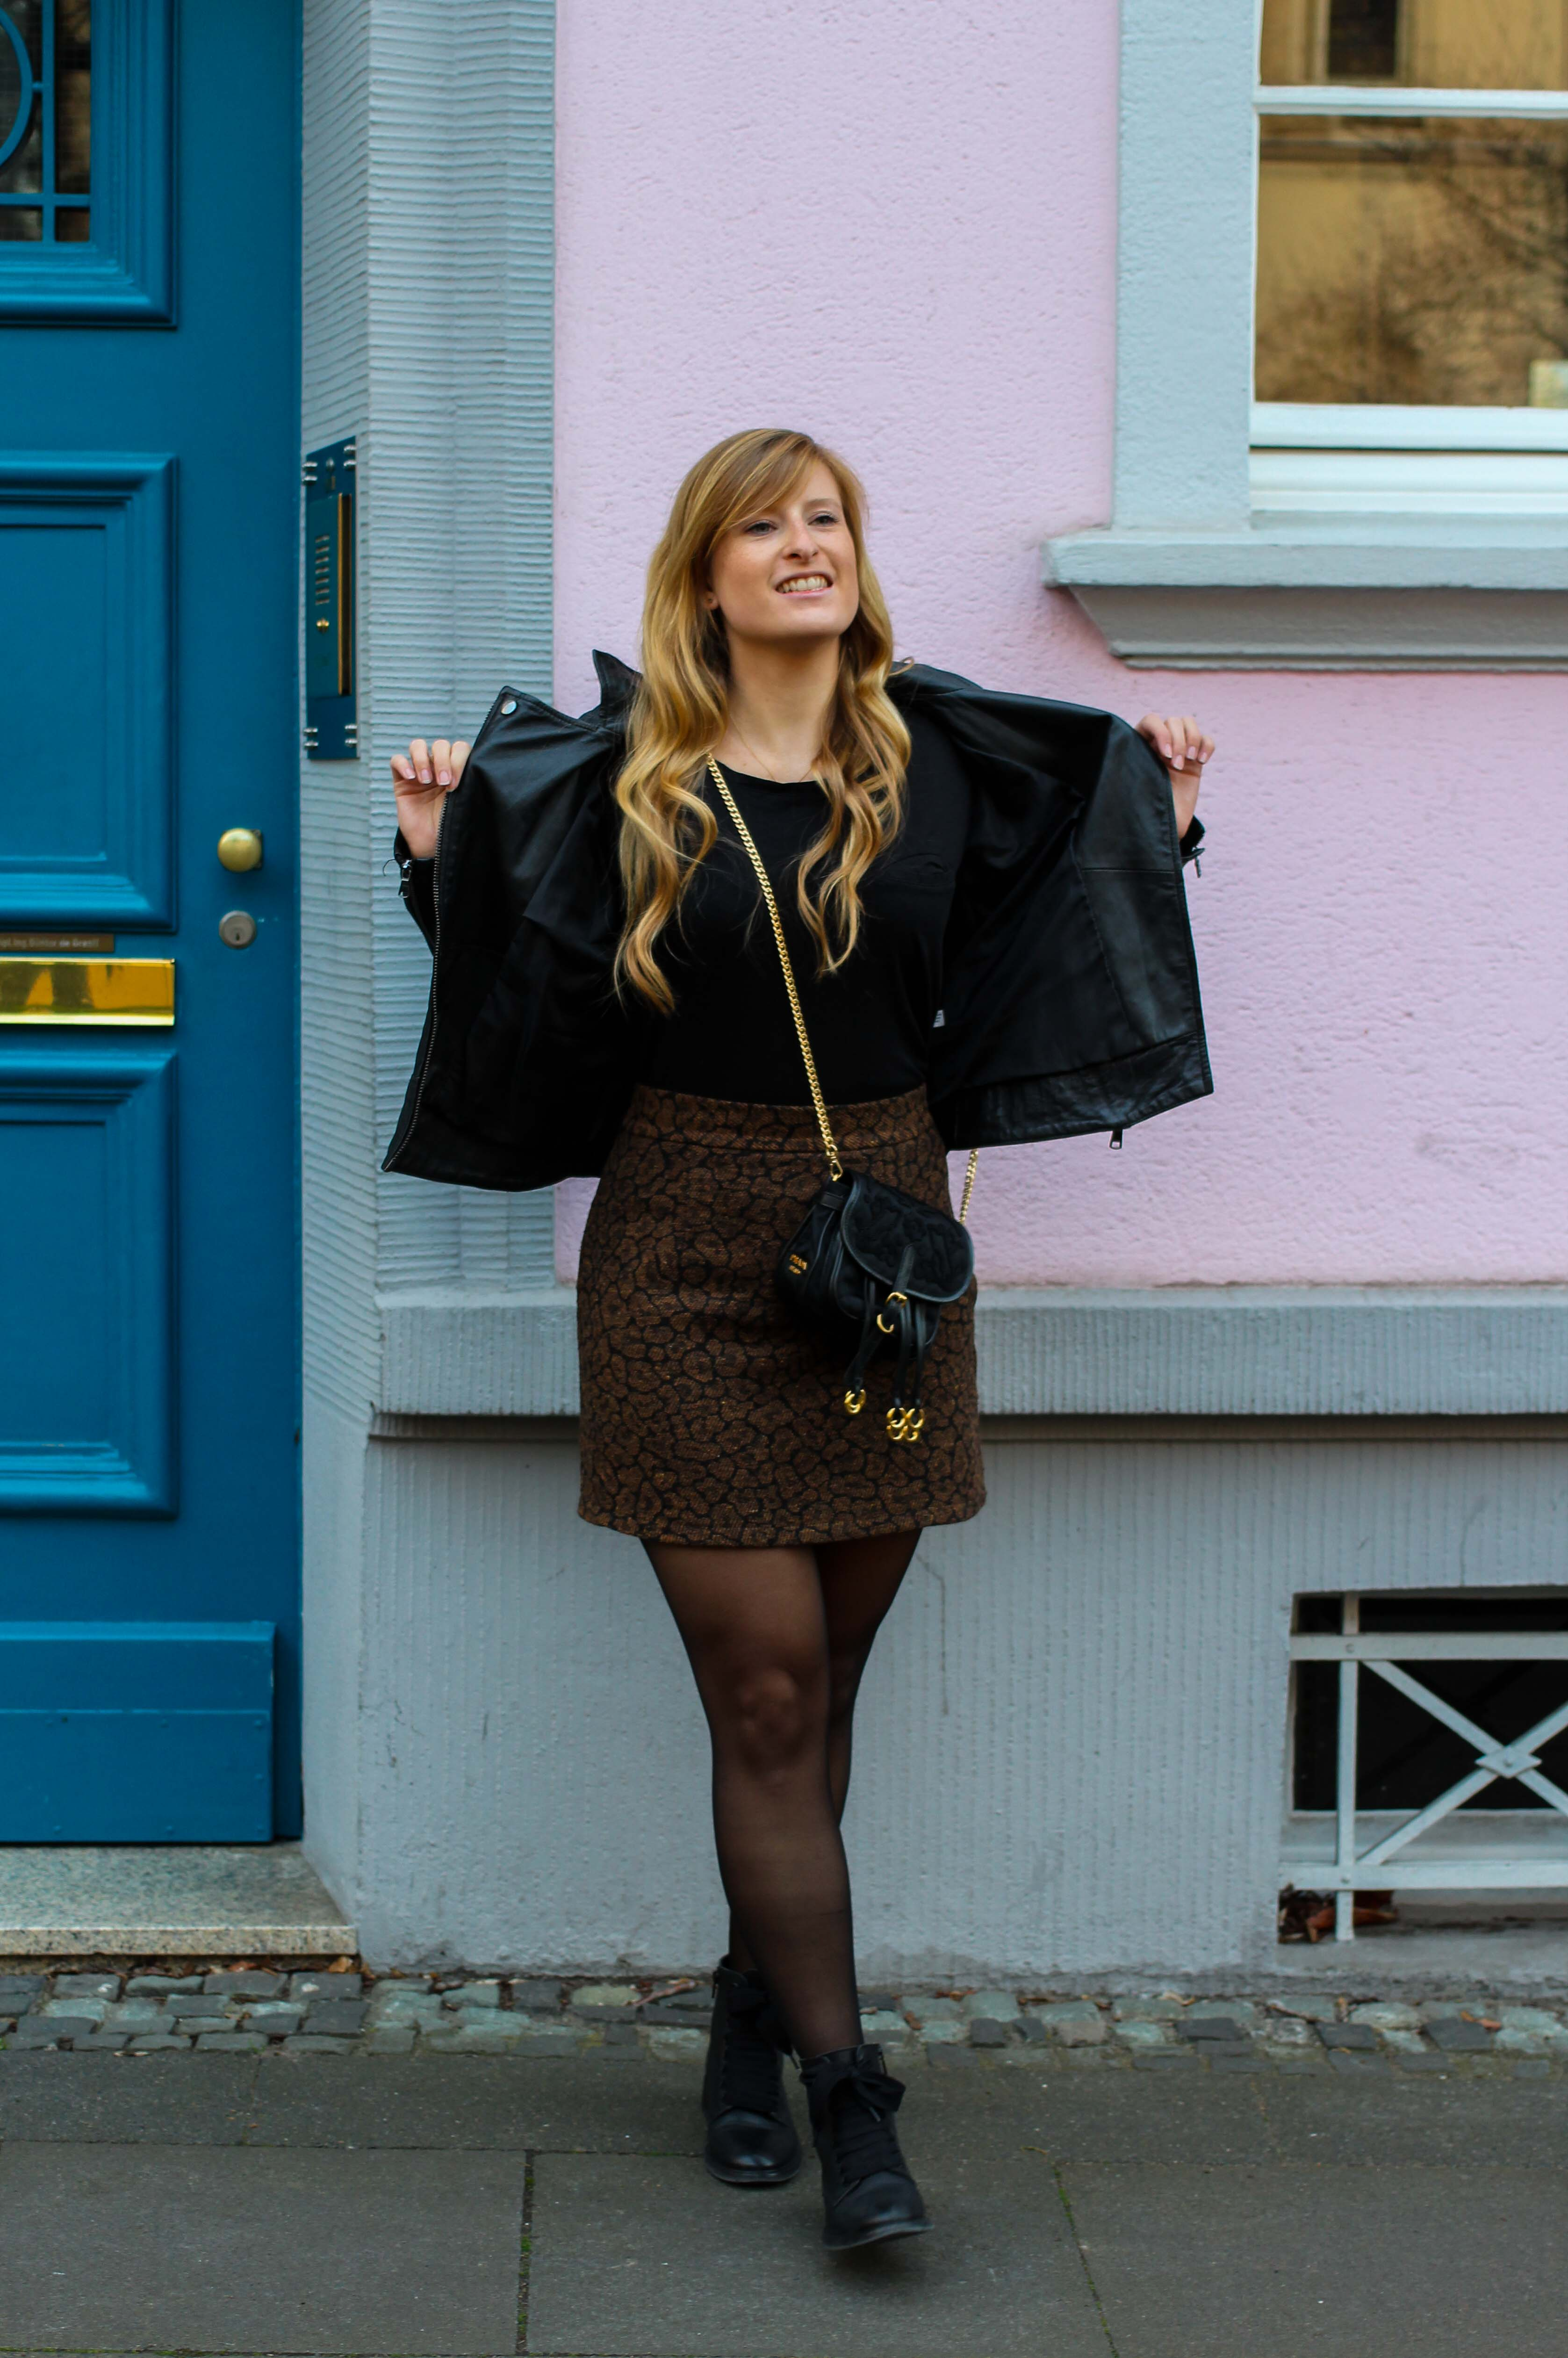 Leo Rock kombinieren Alltag Lederjacke Streetstyle Modeblog Prada Handtasche Stoff Edited Boots Frühling Strumpfhose 1